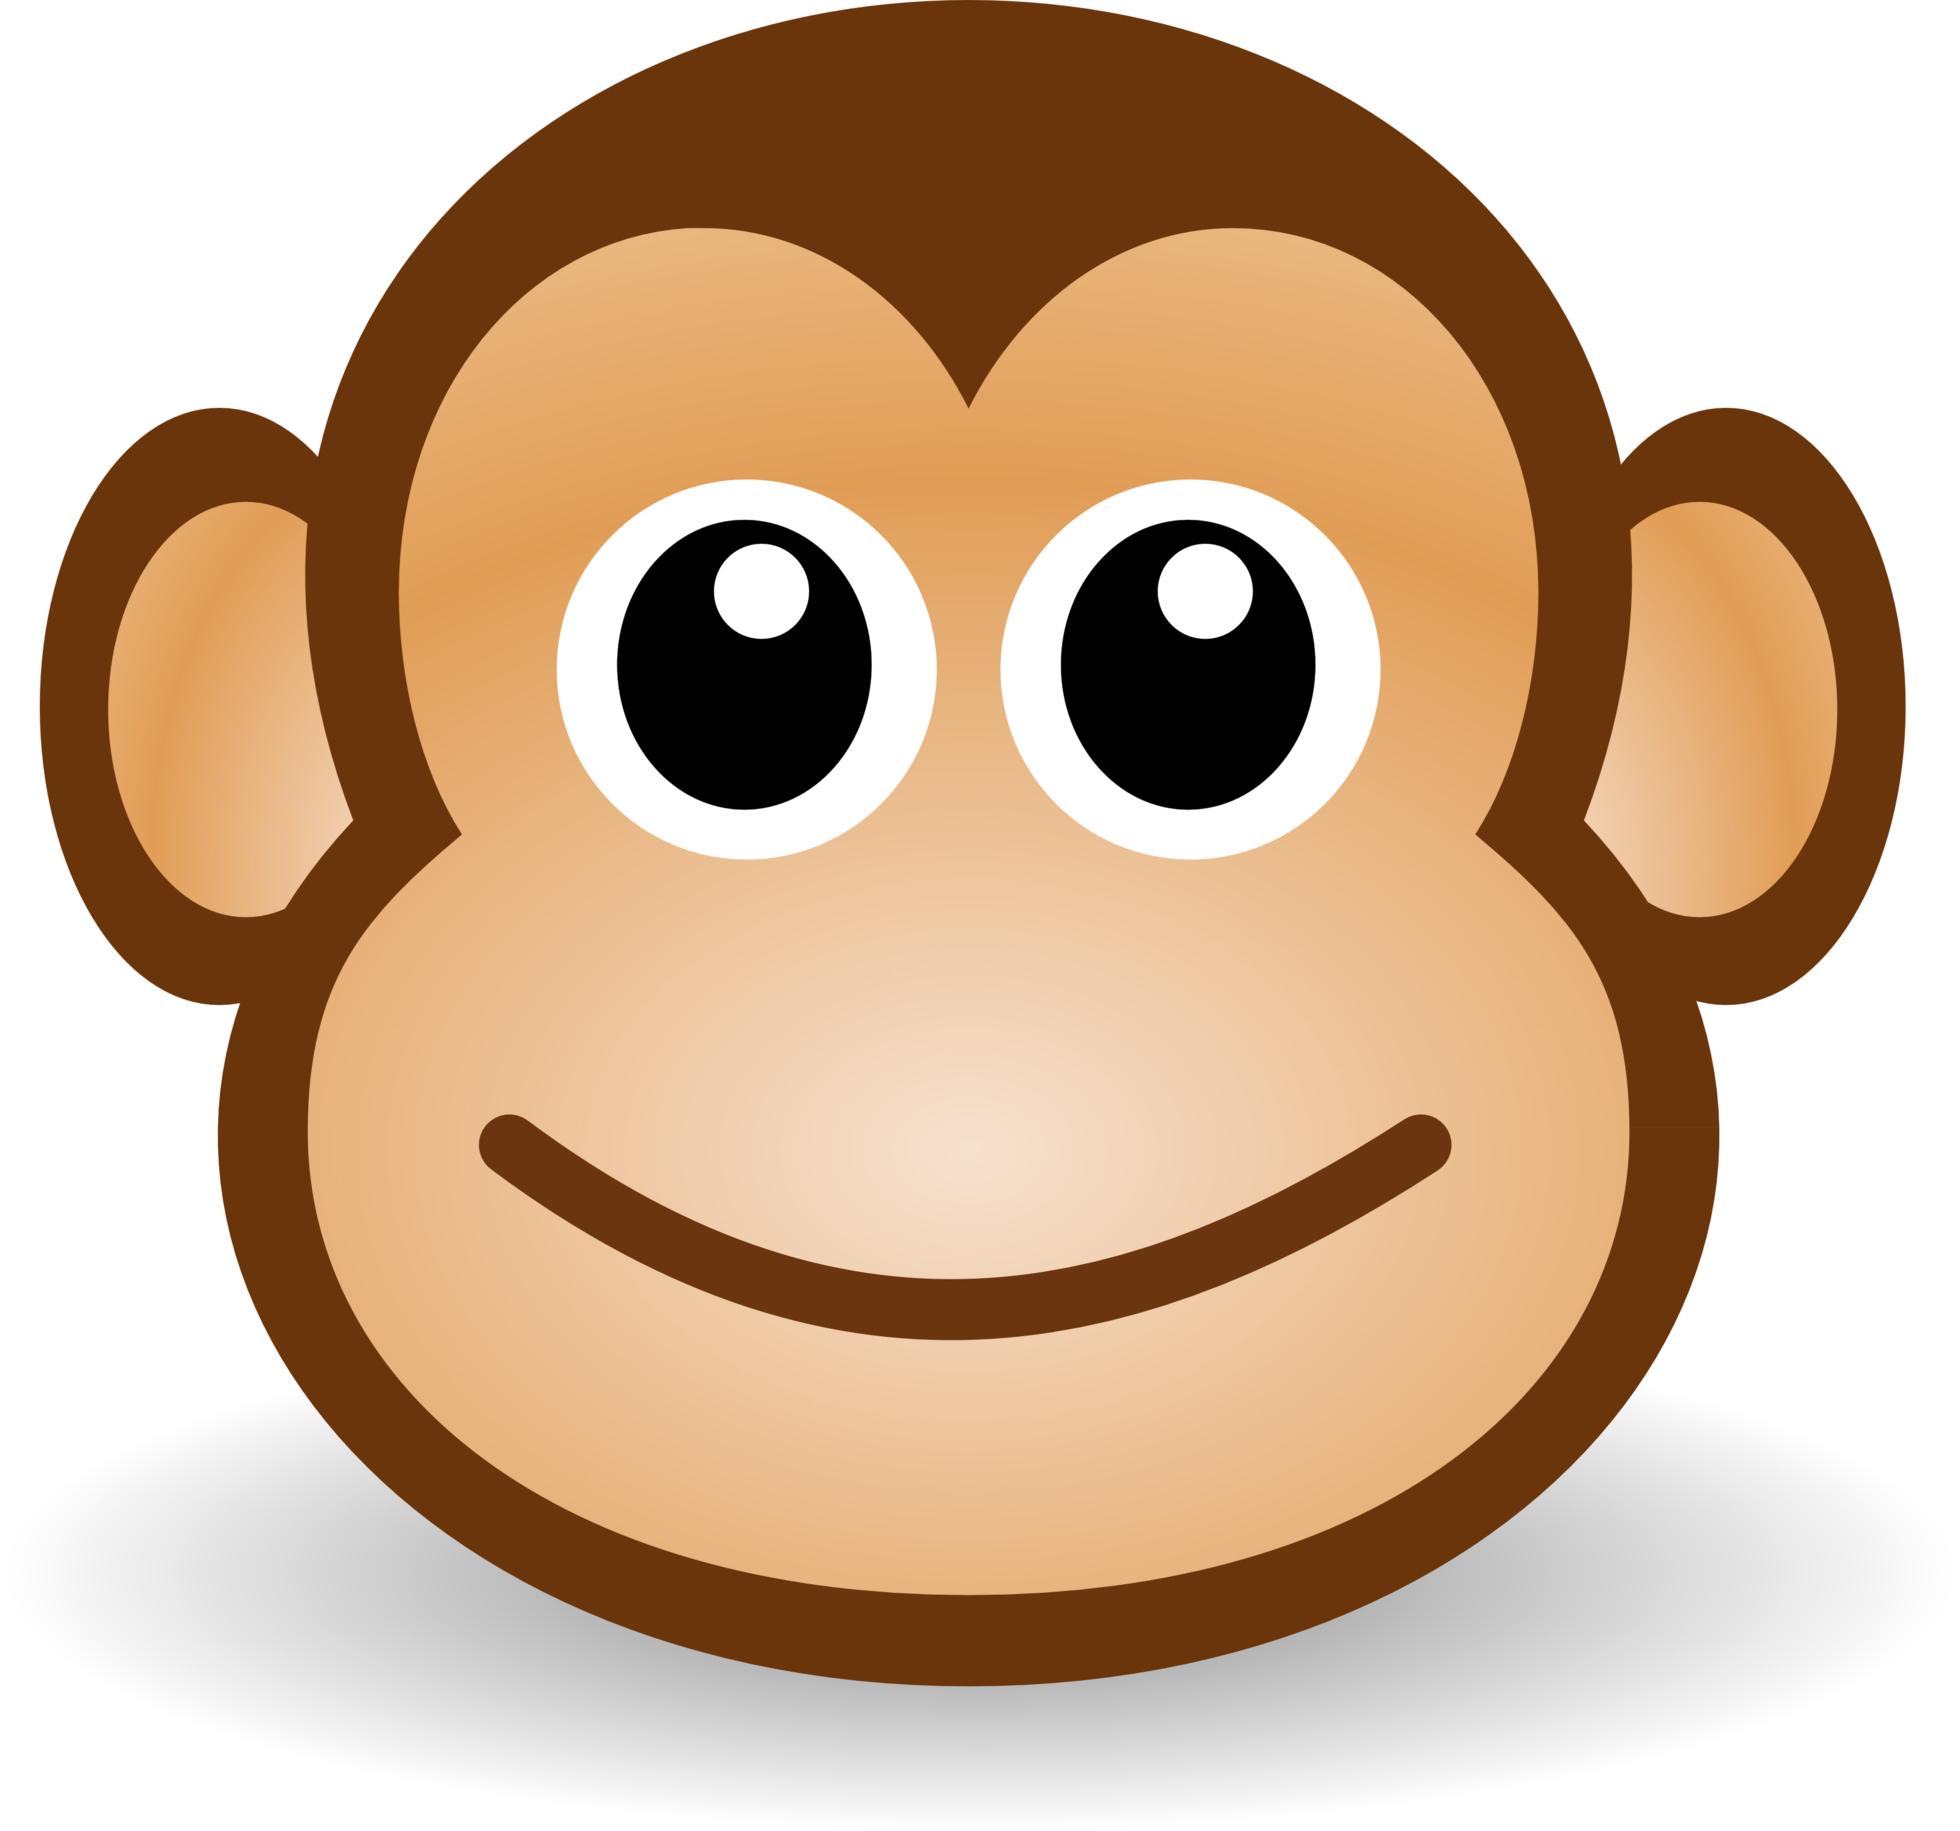 Cartoon monkey clipart vector black and white download Cartoon-Monkey-Clipart-   Clipart Panda - Free Clipart Images vector black and white download